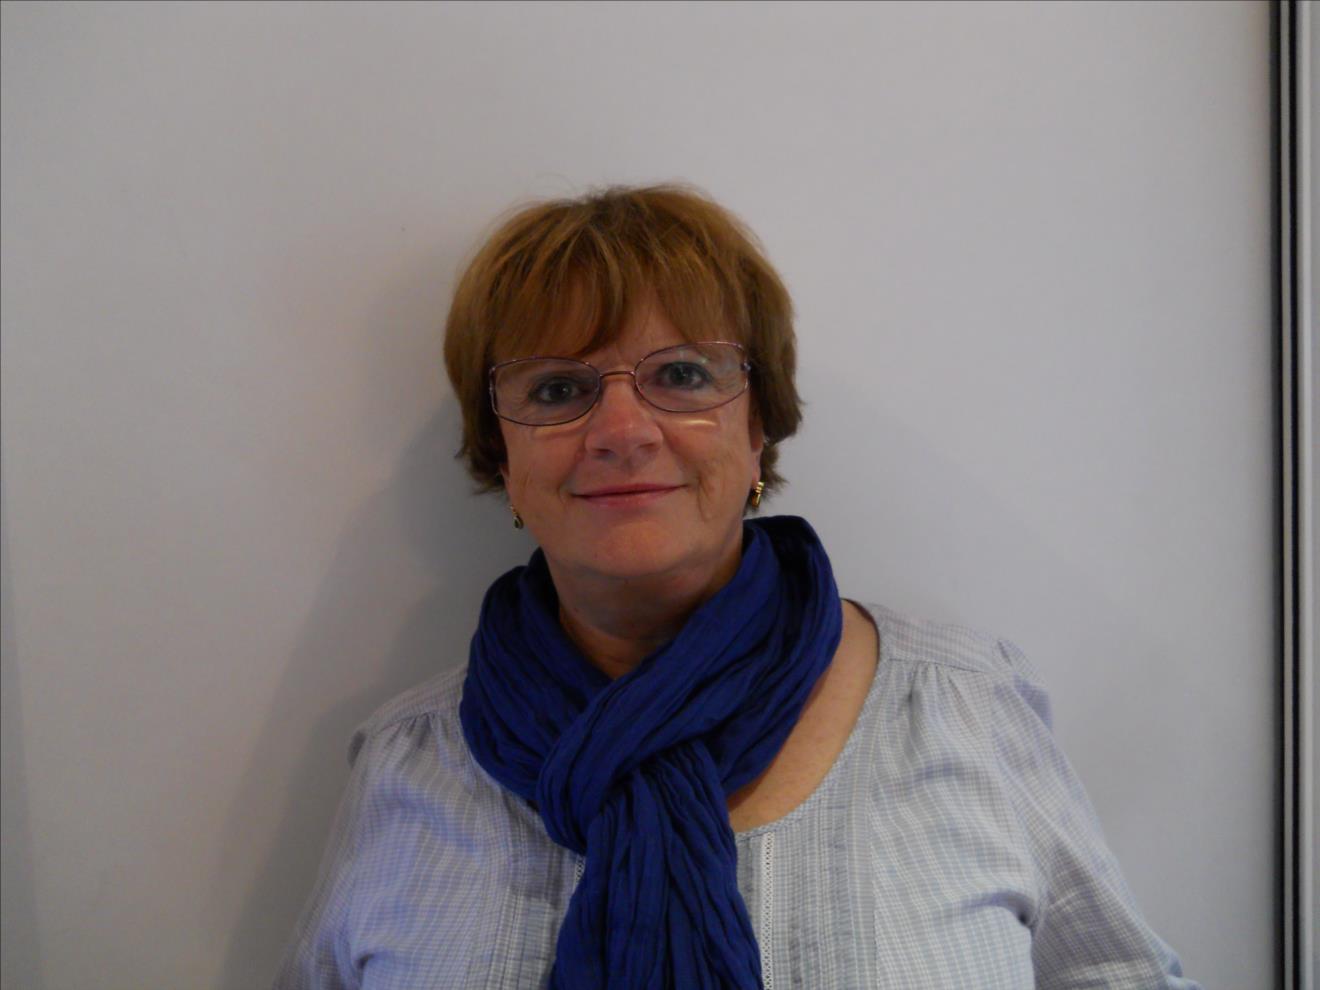 Arlette LIENHART